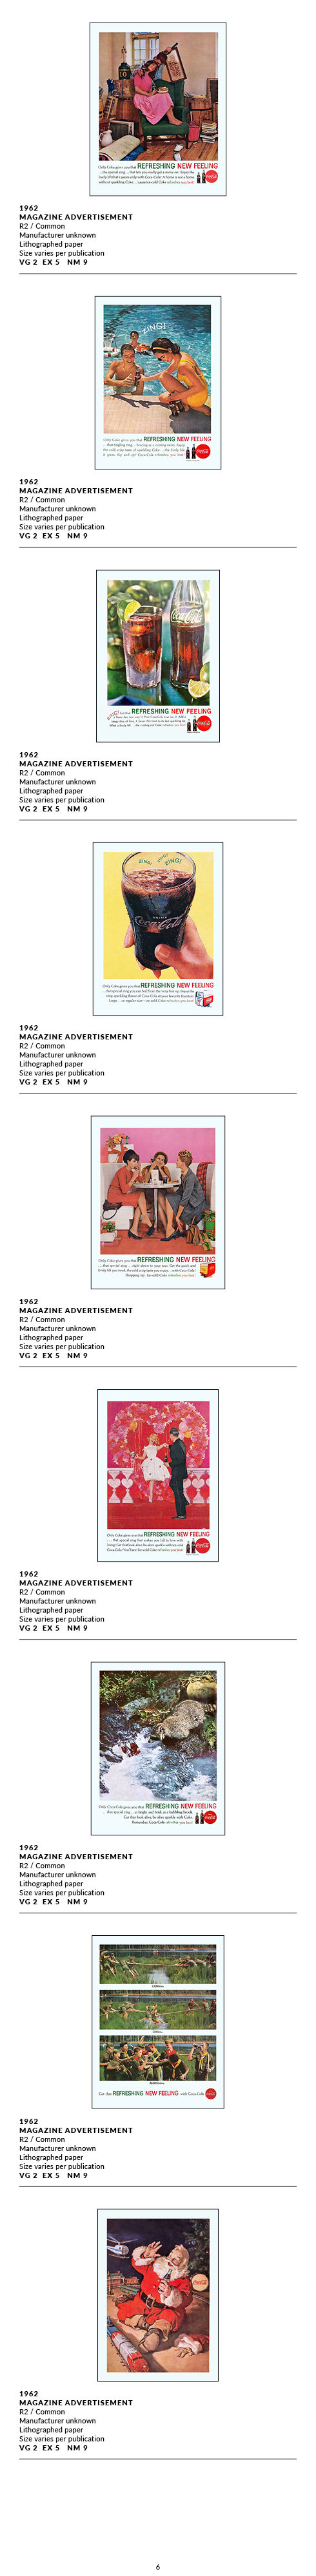 Desktop 1960-64 Ads Master6.jpg